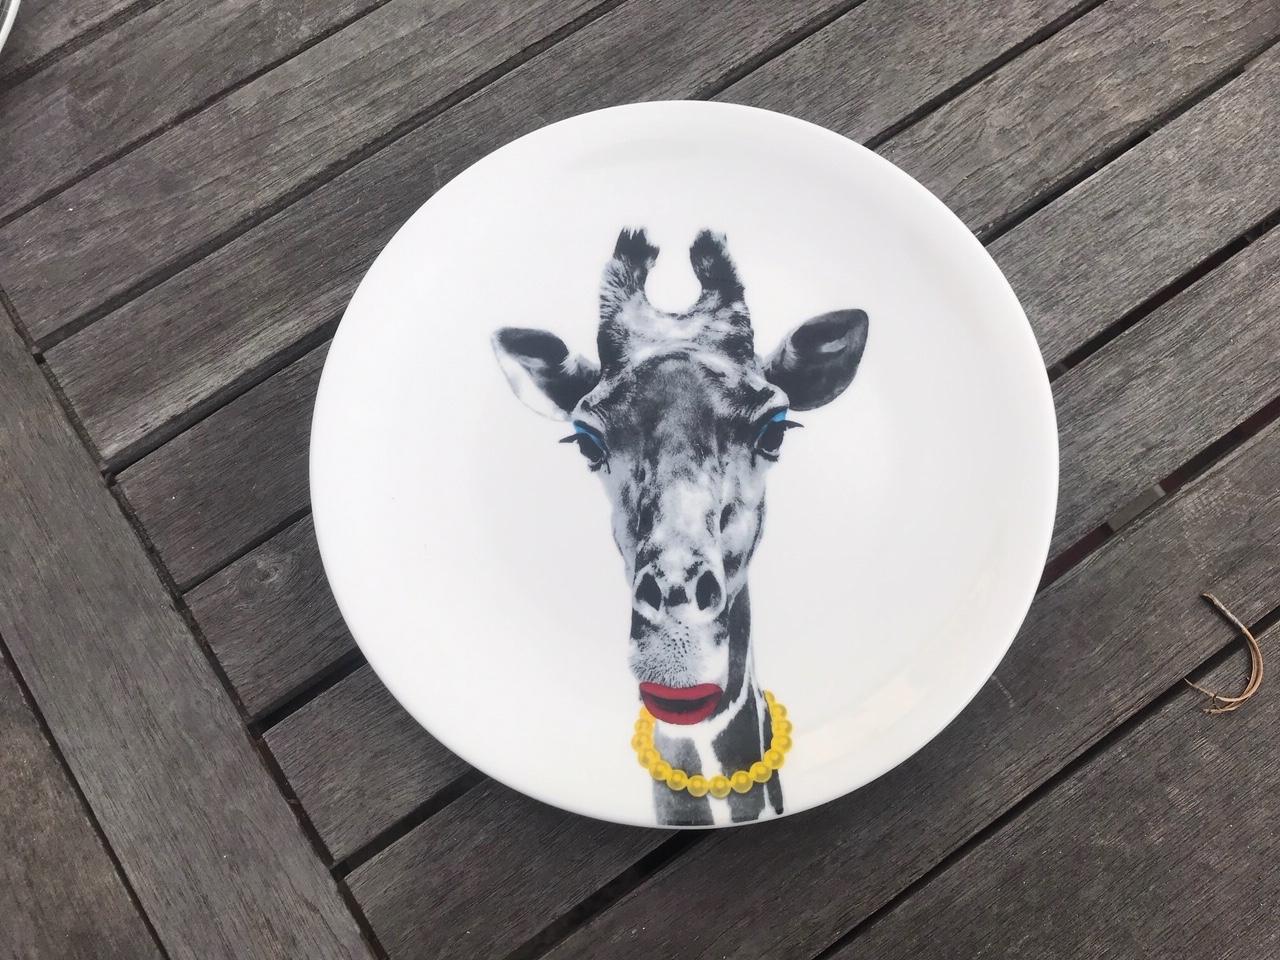 "New Wild Dining ""JustMustard"" Brand Giraffe Plate: 16,400 +/- 400 ppm Lead"